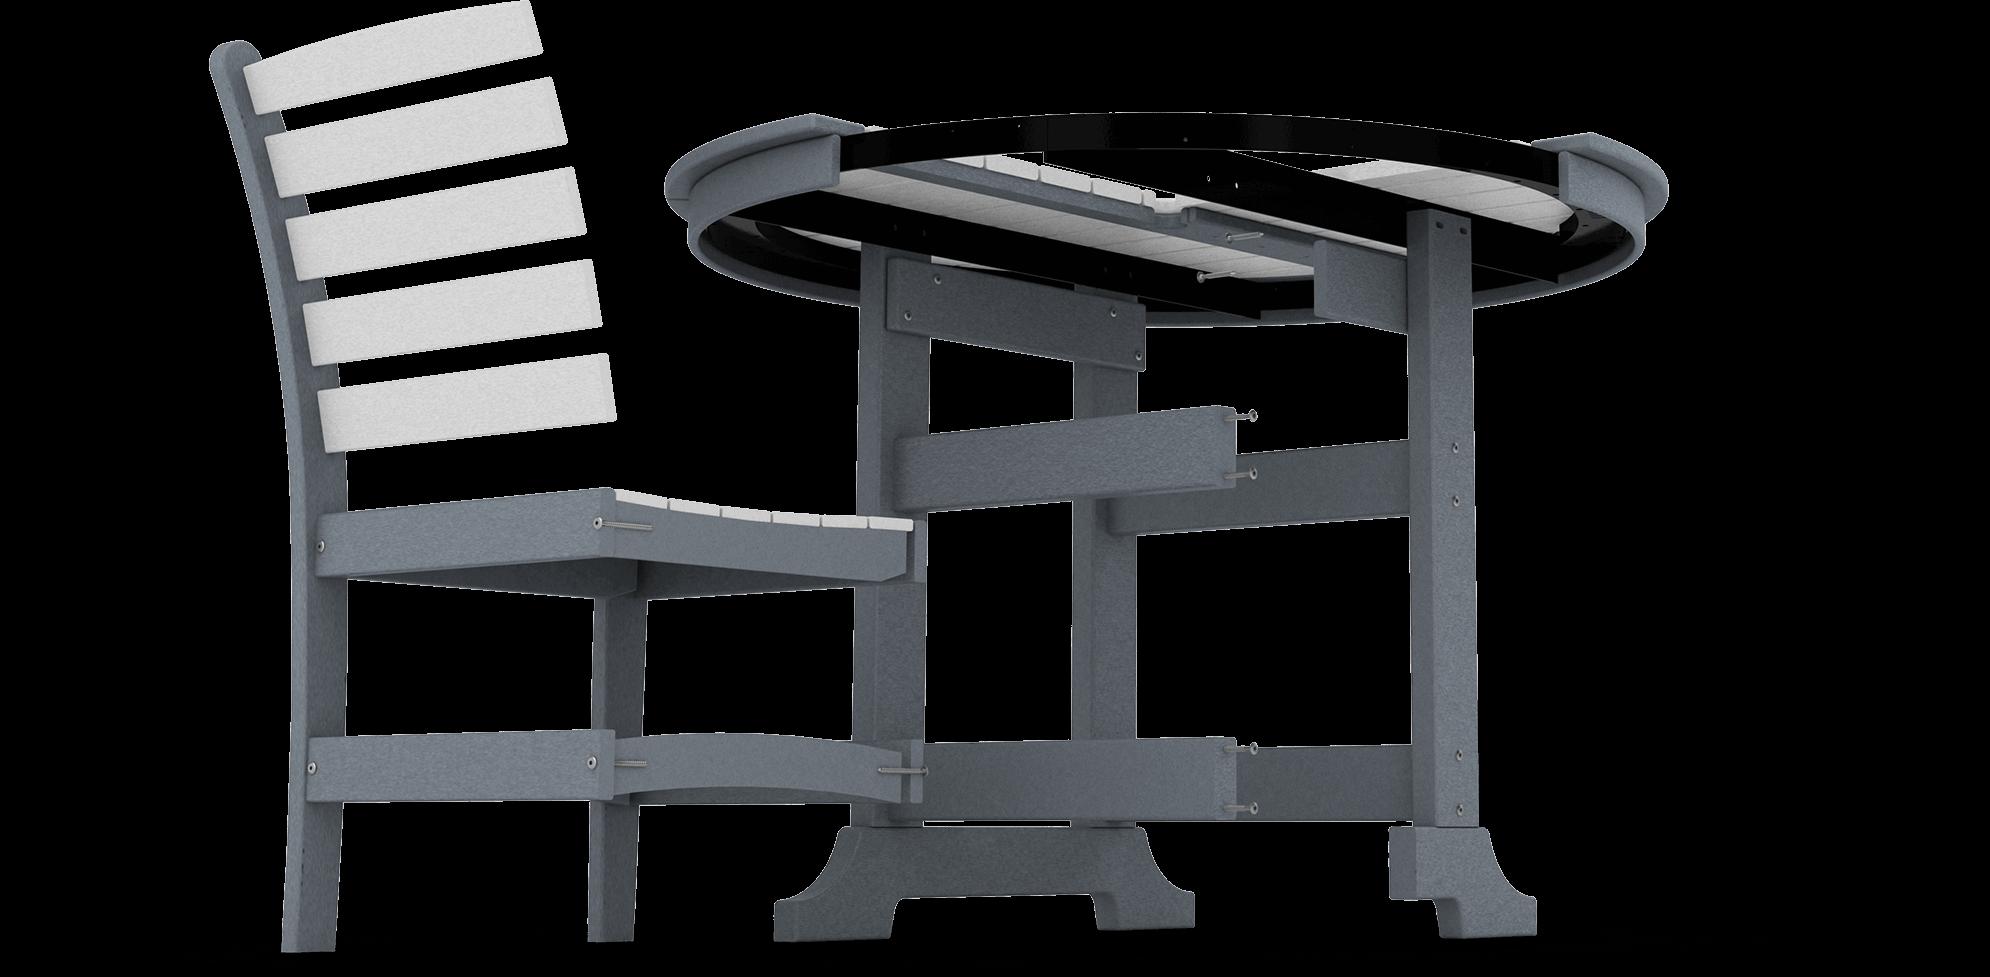 sister bay furniture commercial grade furniture